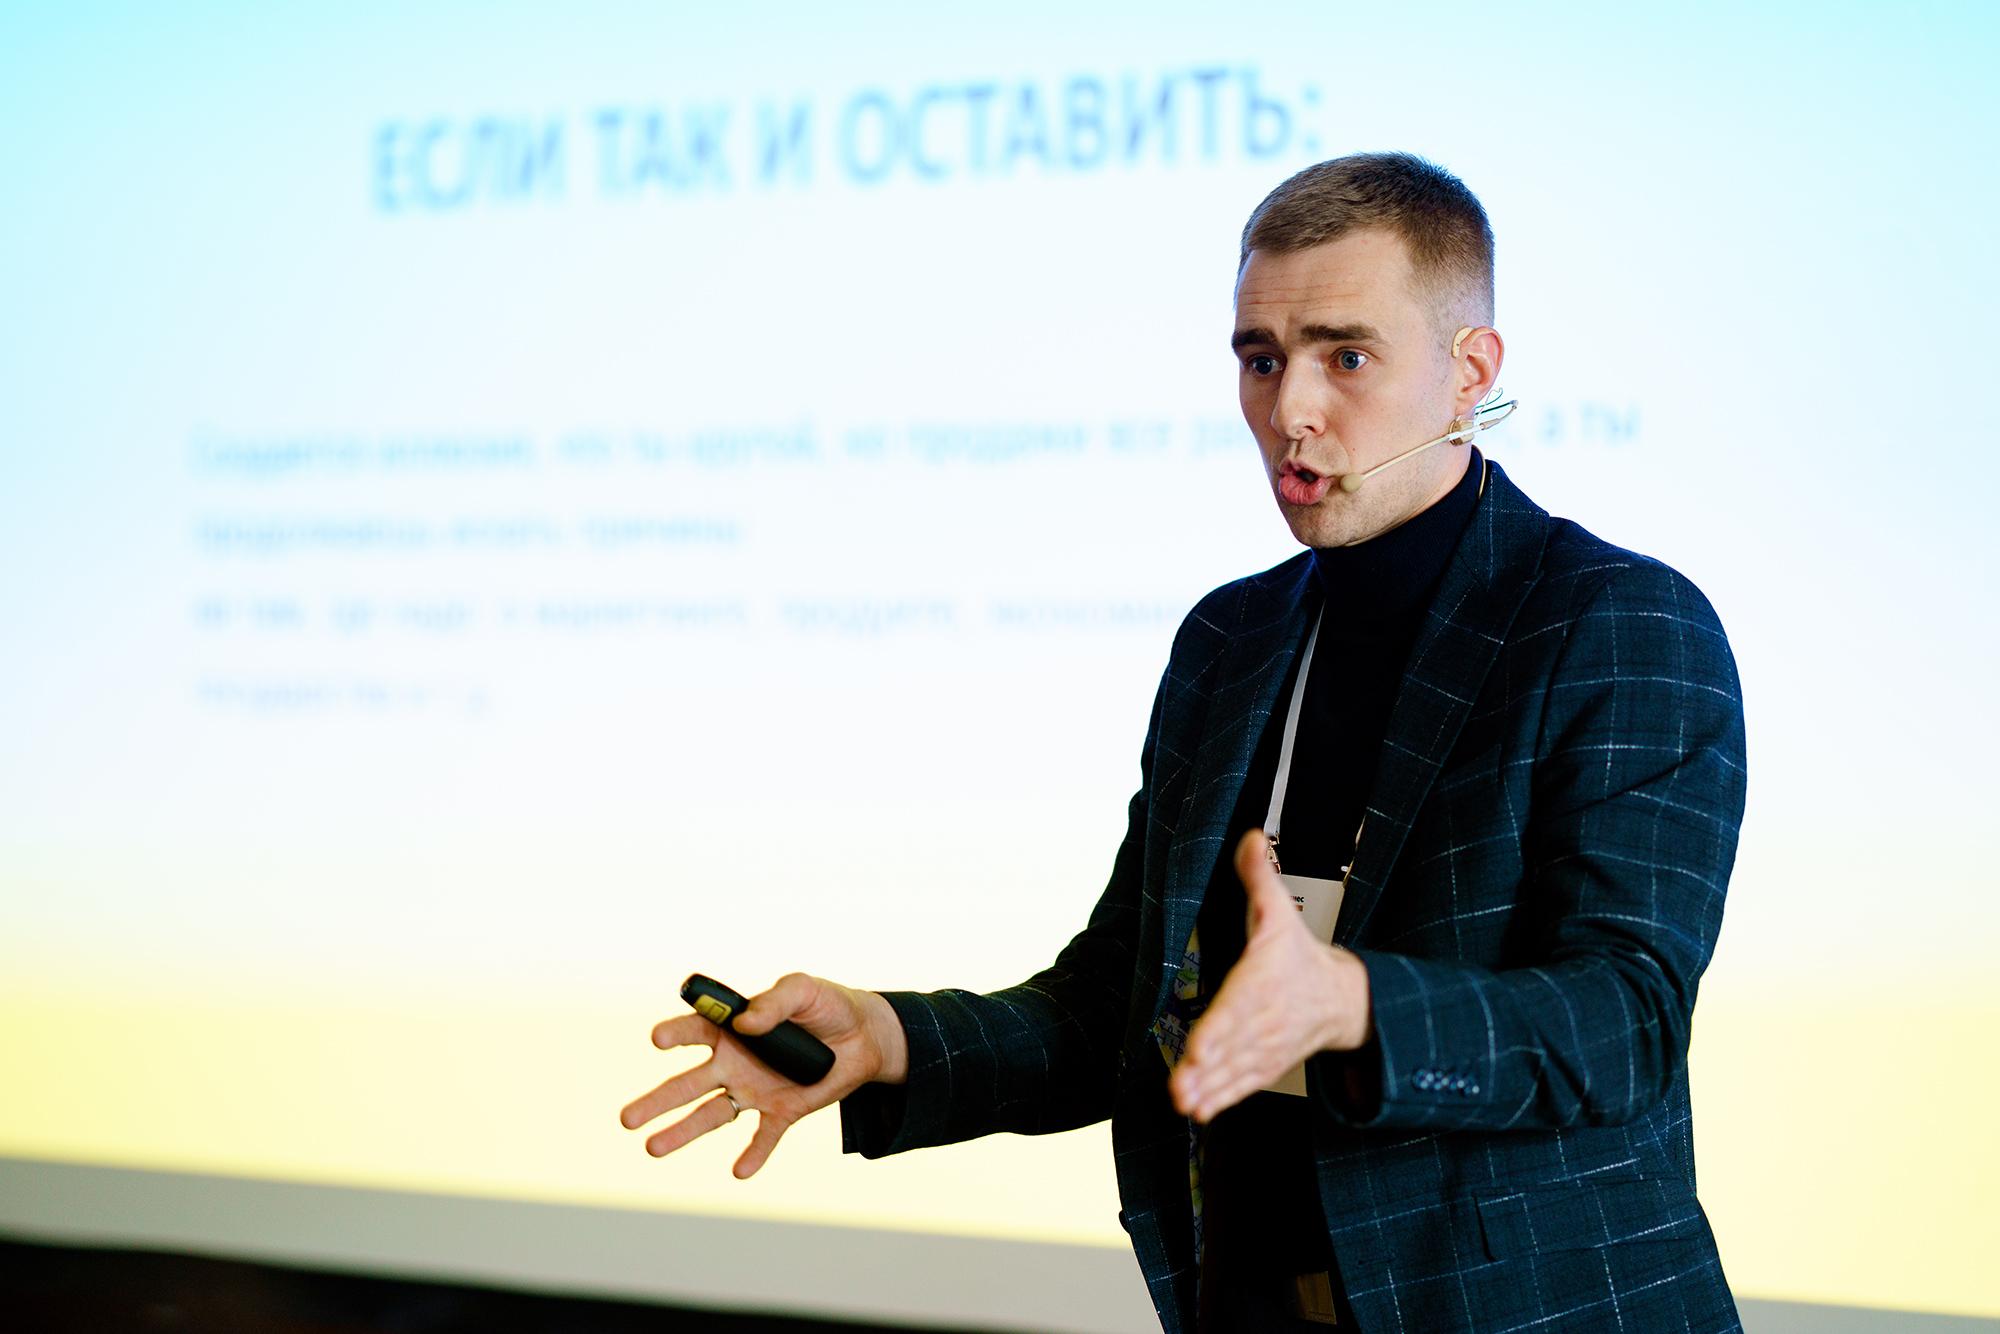 Андрей Голованов. Фото: Александр Глебов, probusiness.io